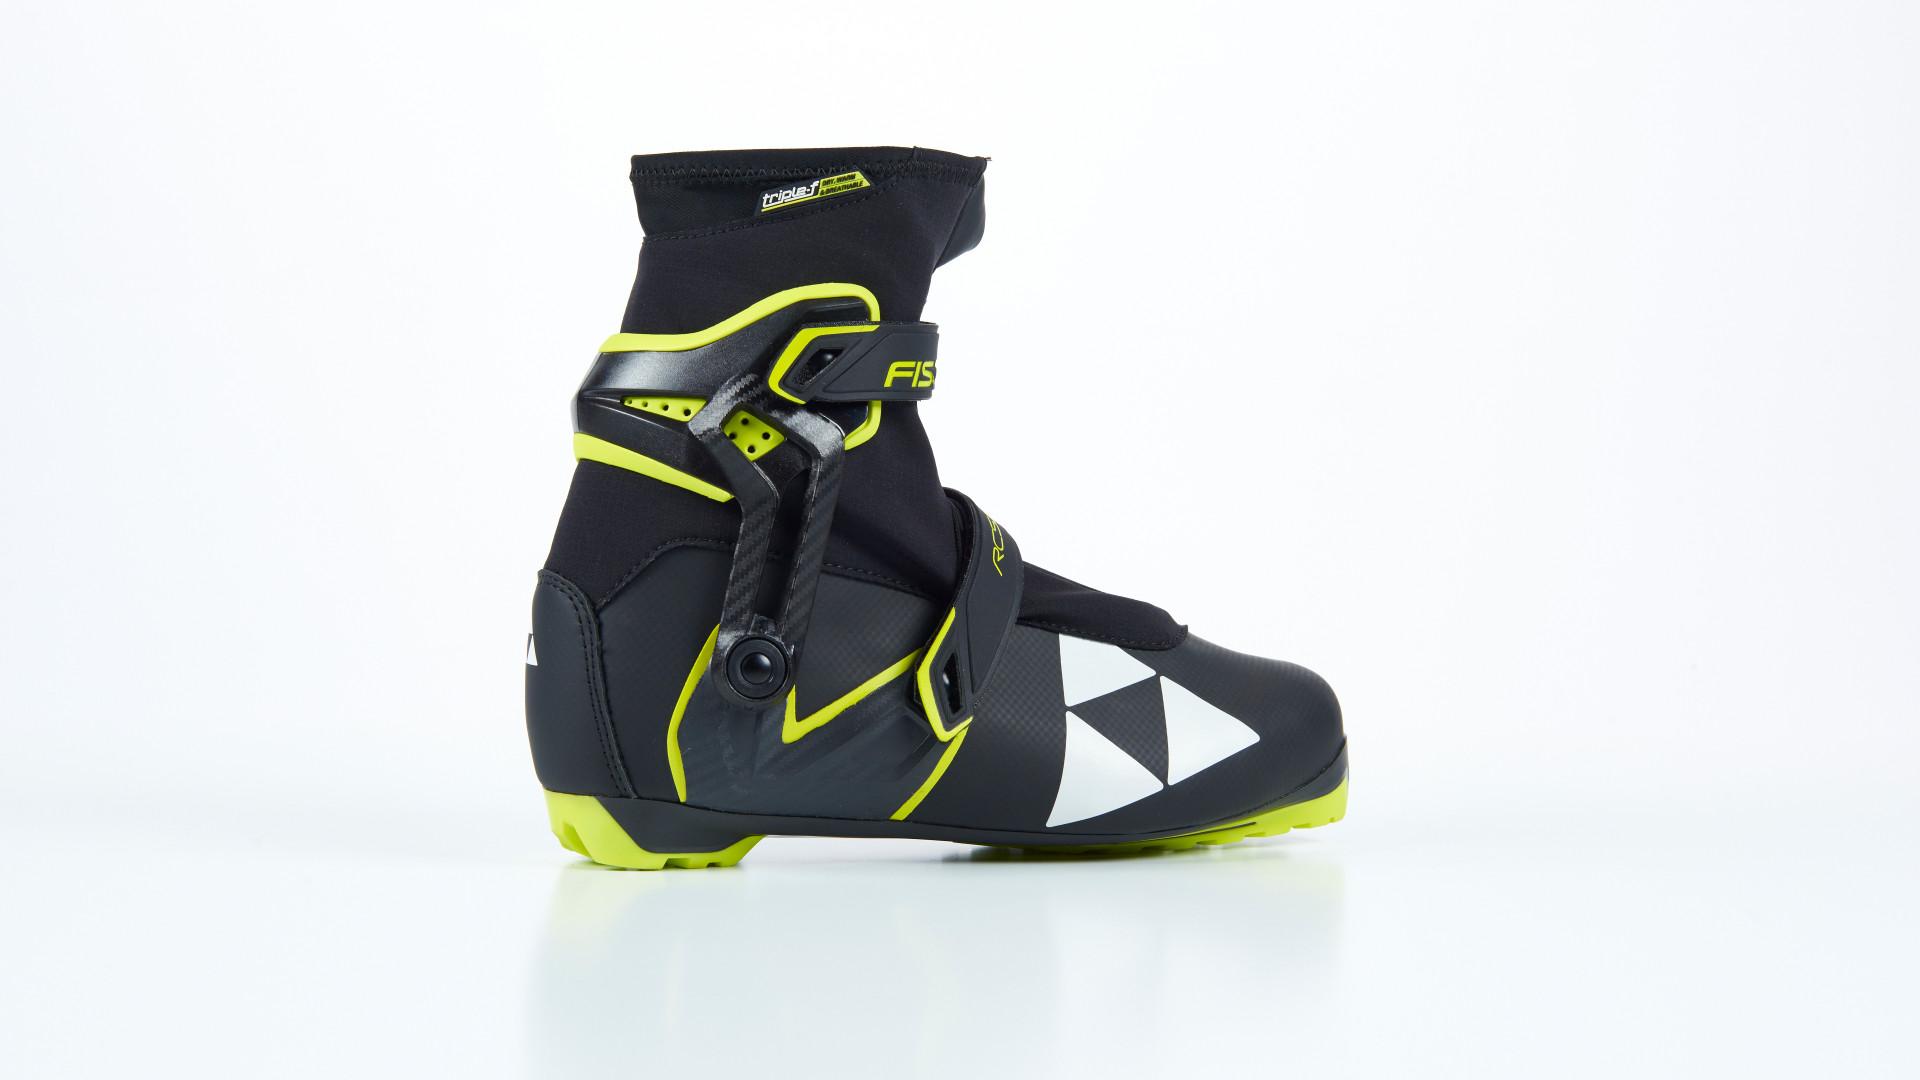 Langlauf-Skischuh RCS Skate